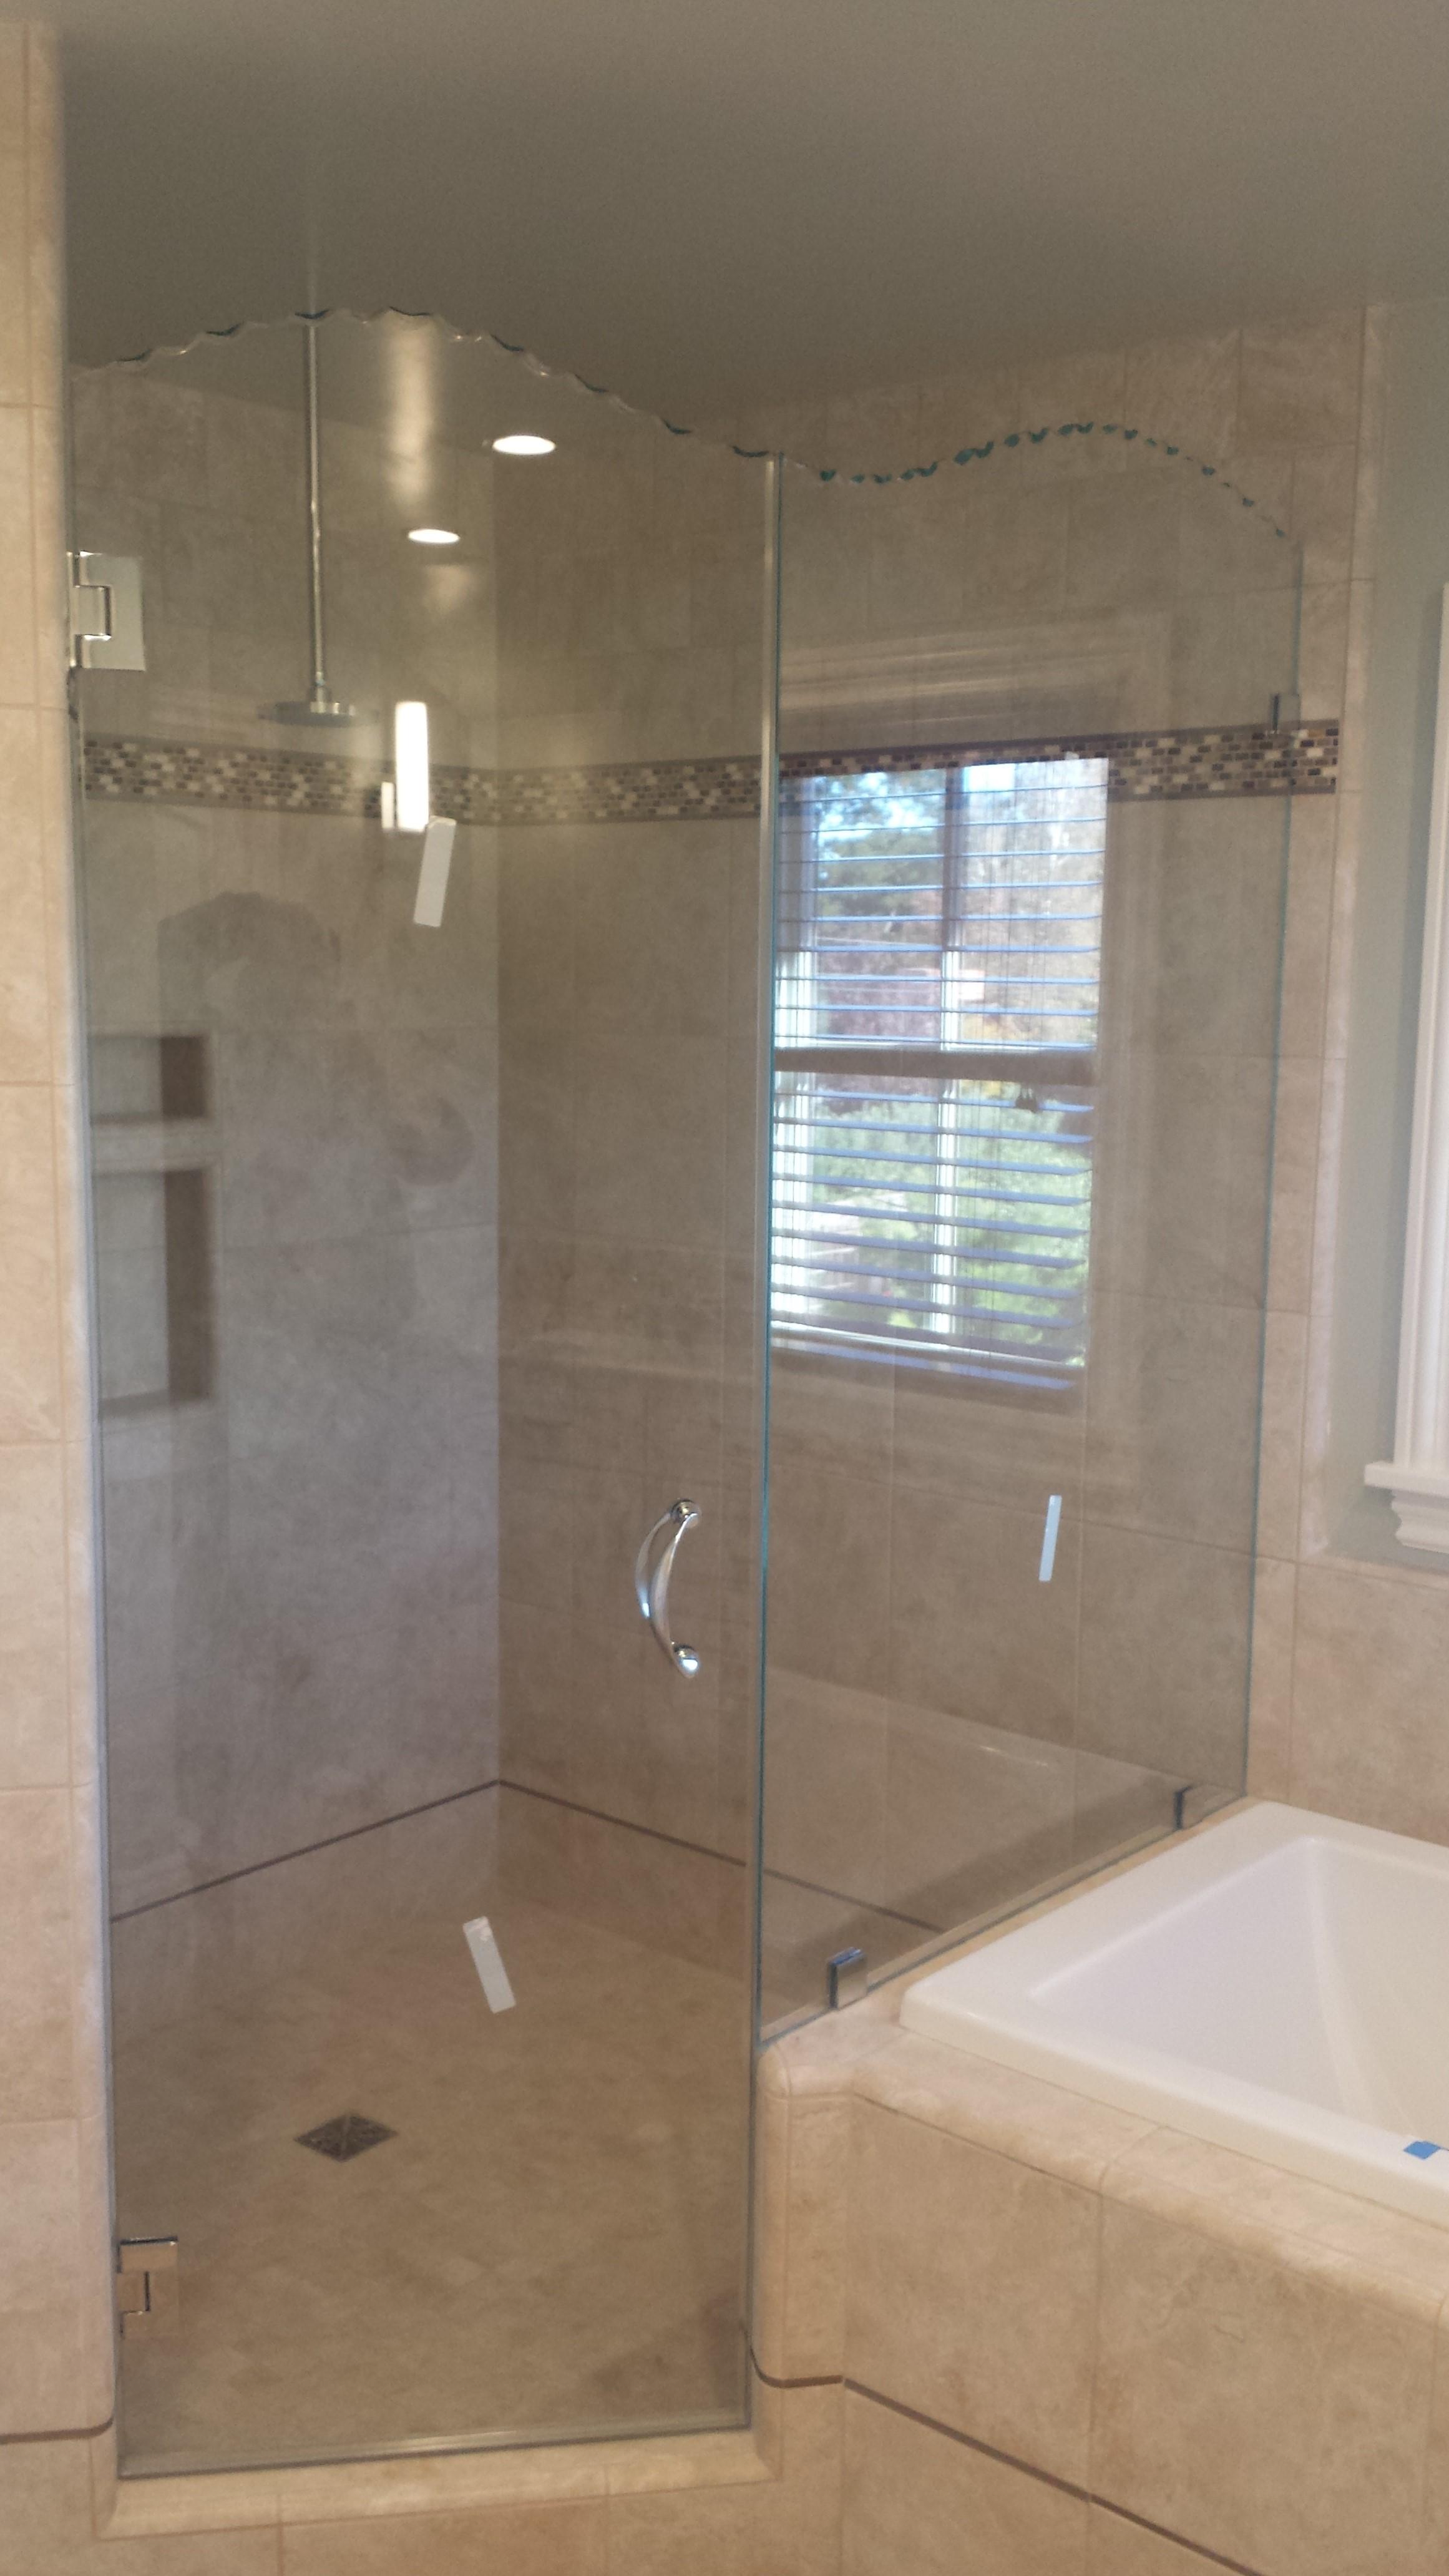 A 1 Glass Shower Door Co 2534 Seaboard Avenue San Jose Ca 95131